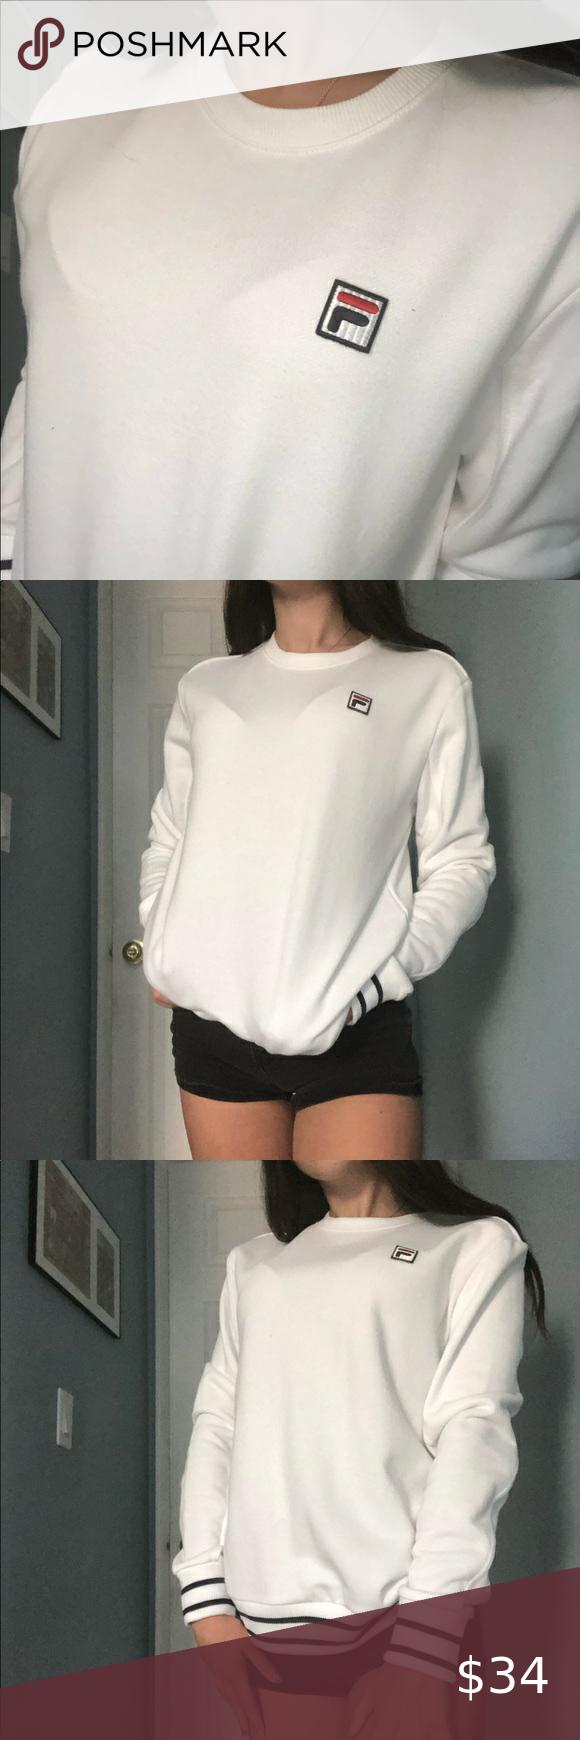 Fila White Crewneck Sweatshirt Size Small Fila White Crewneck Sweatshirt Size Small Brand New With White Crewneck Sweatshirt Crew Neck Sweatshirt Sweatshirts [ 1740 x 580 Pixel ]